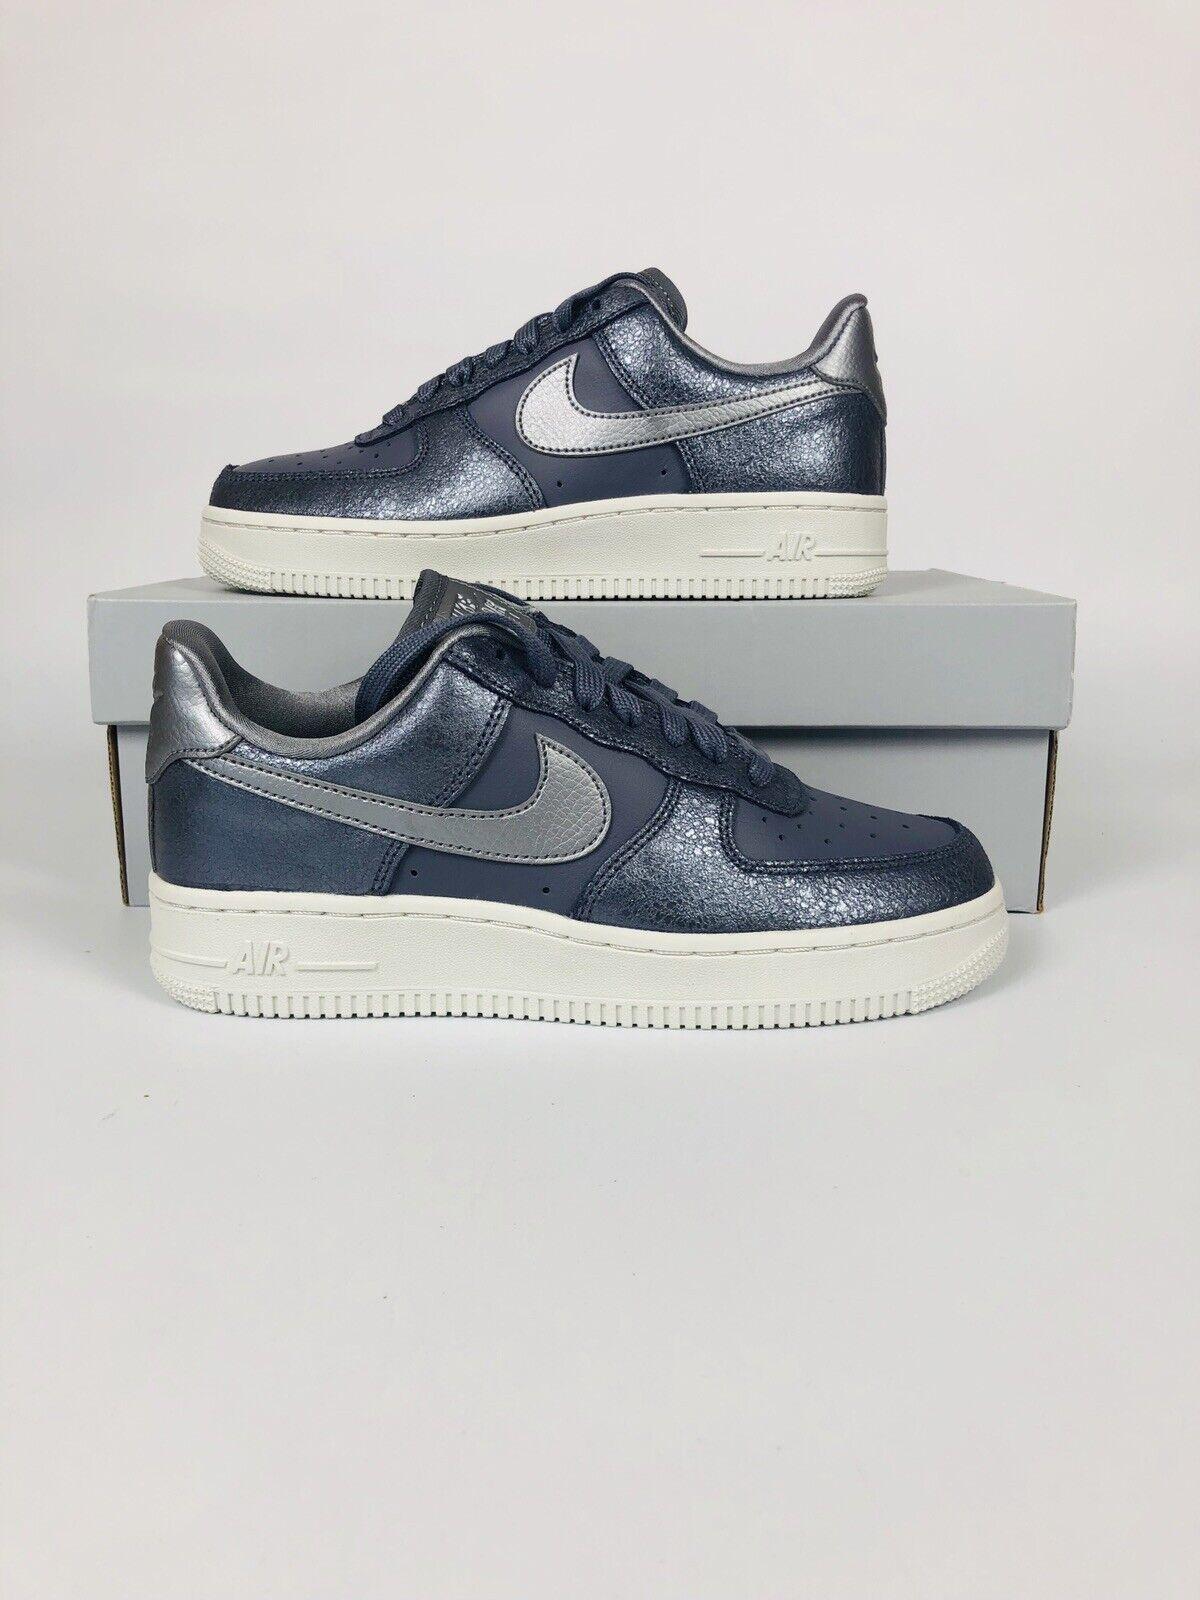 New Nike Air Force 1 07 Premium Women's Running shoes  896185-005